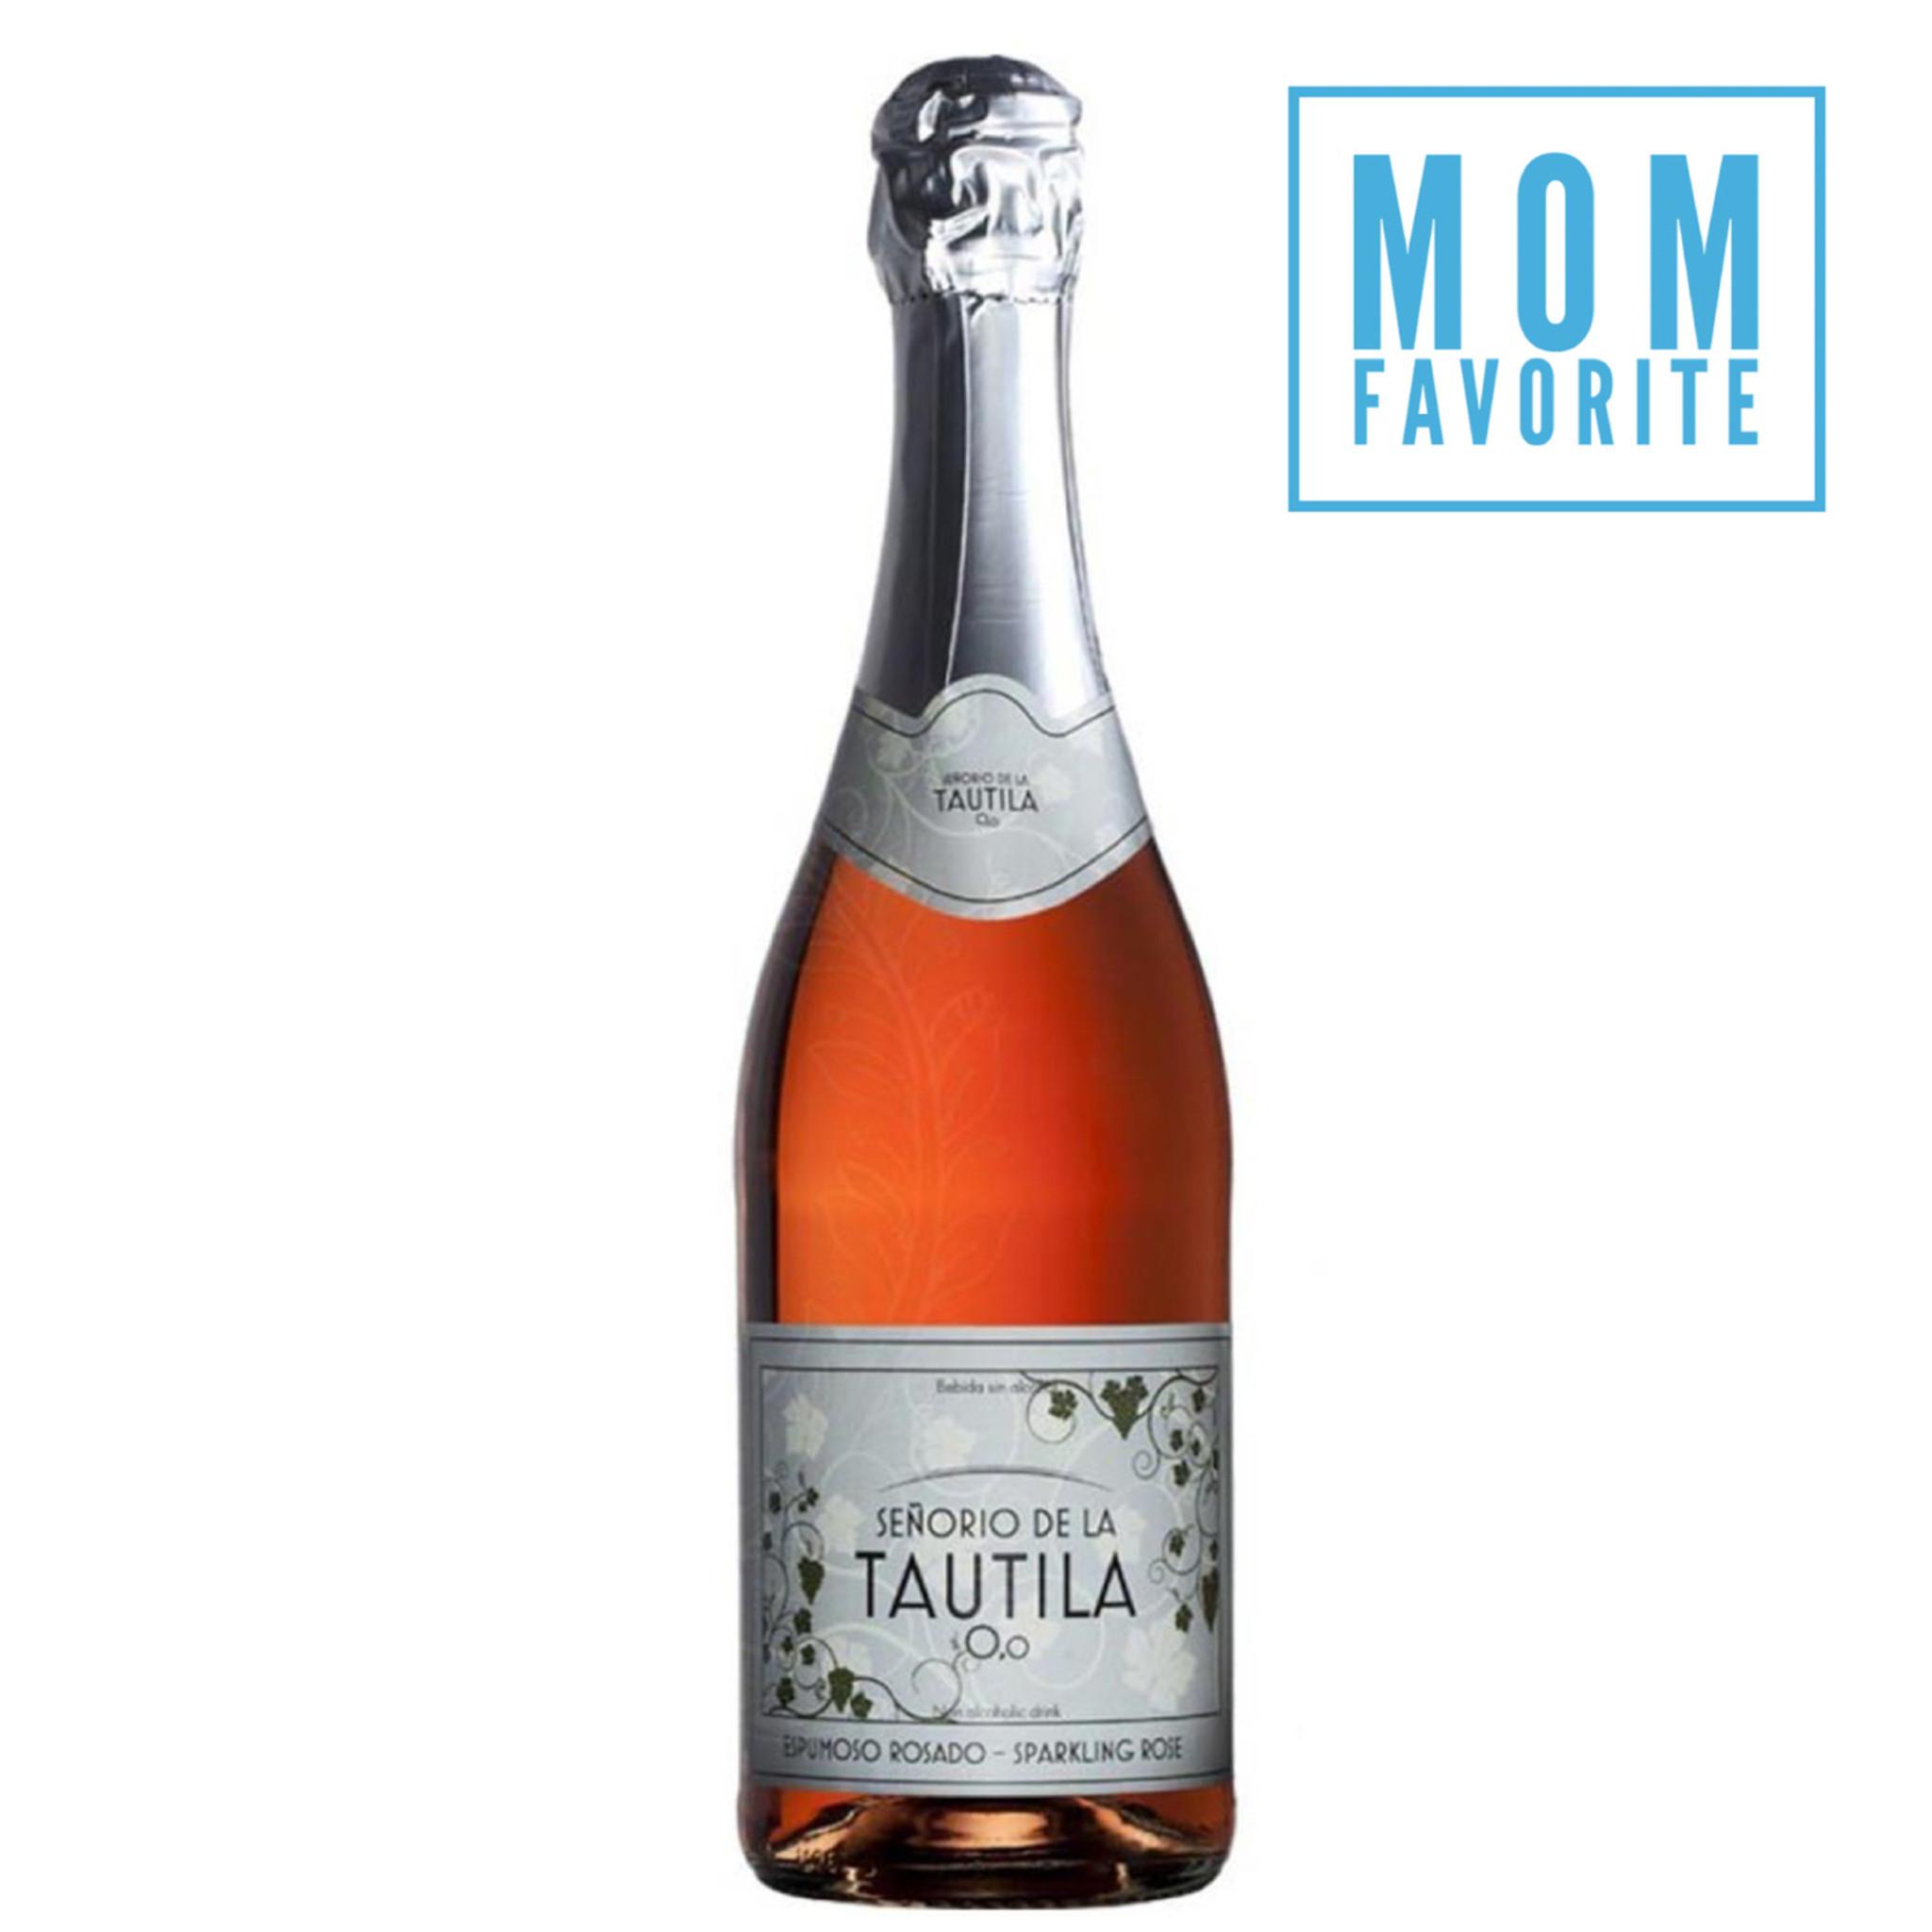 Tautila Espumoso Rosado Alcohol Free Sparkling Rose Wine 750ml